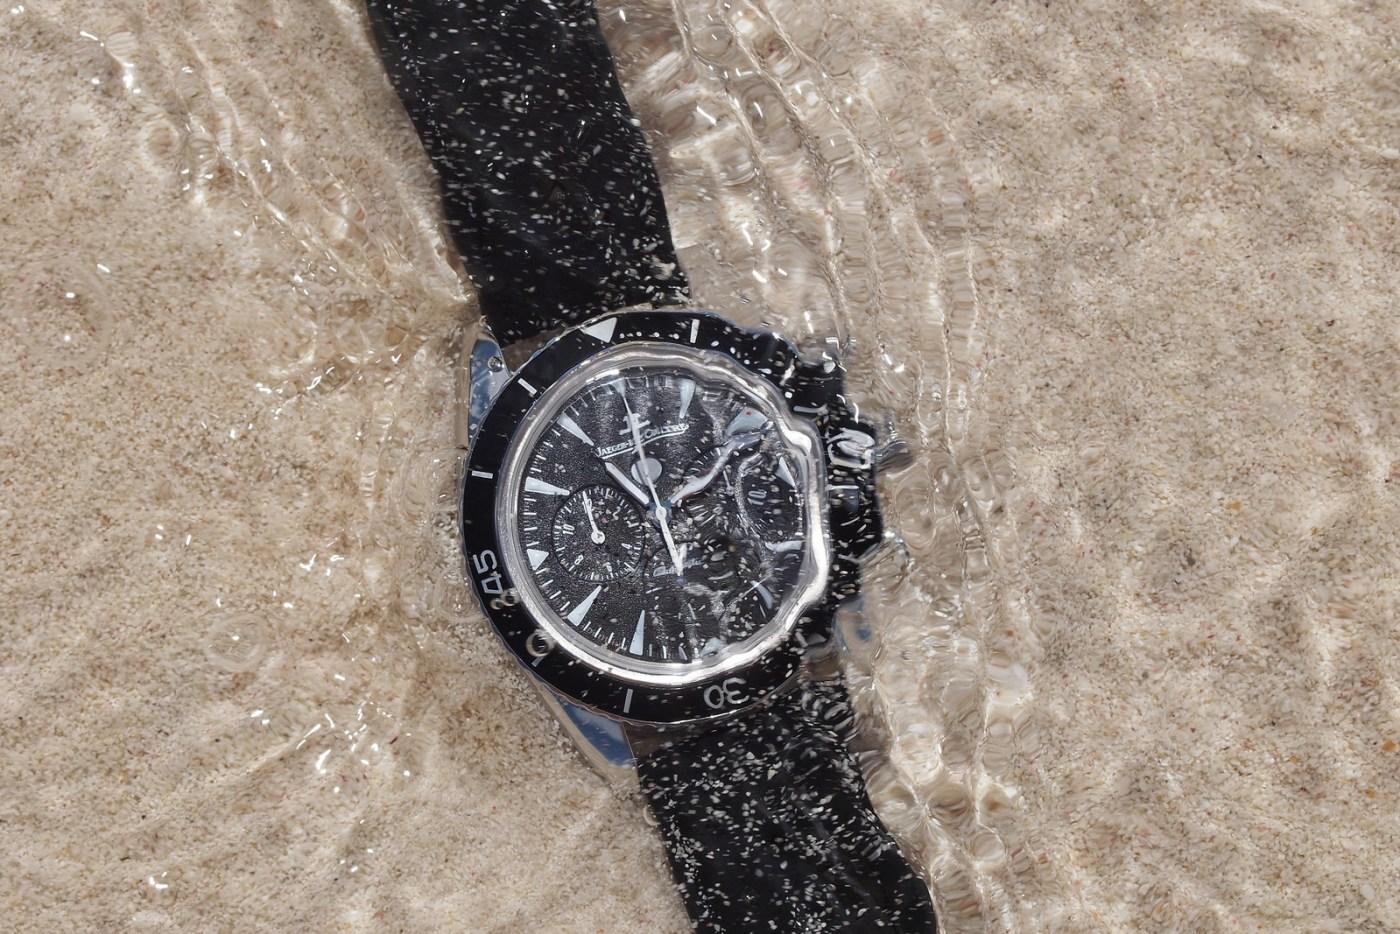 aeger-LeCoultre Deep Sea Chronograph